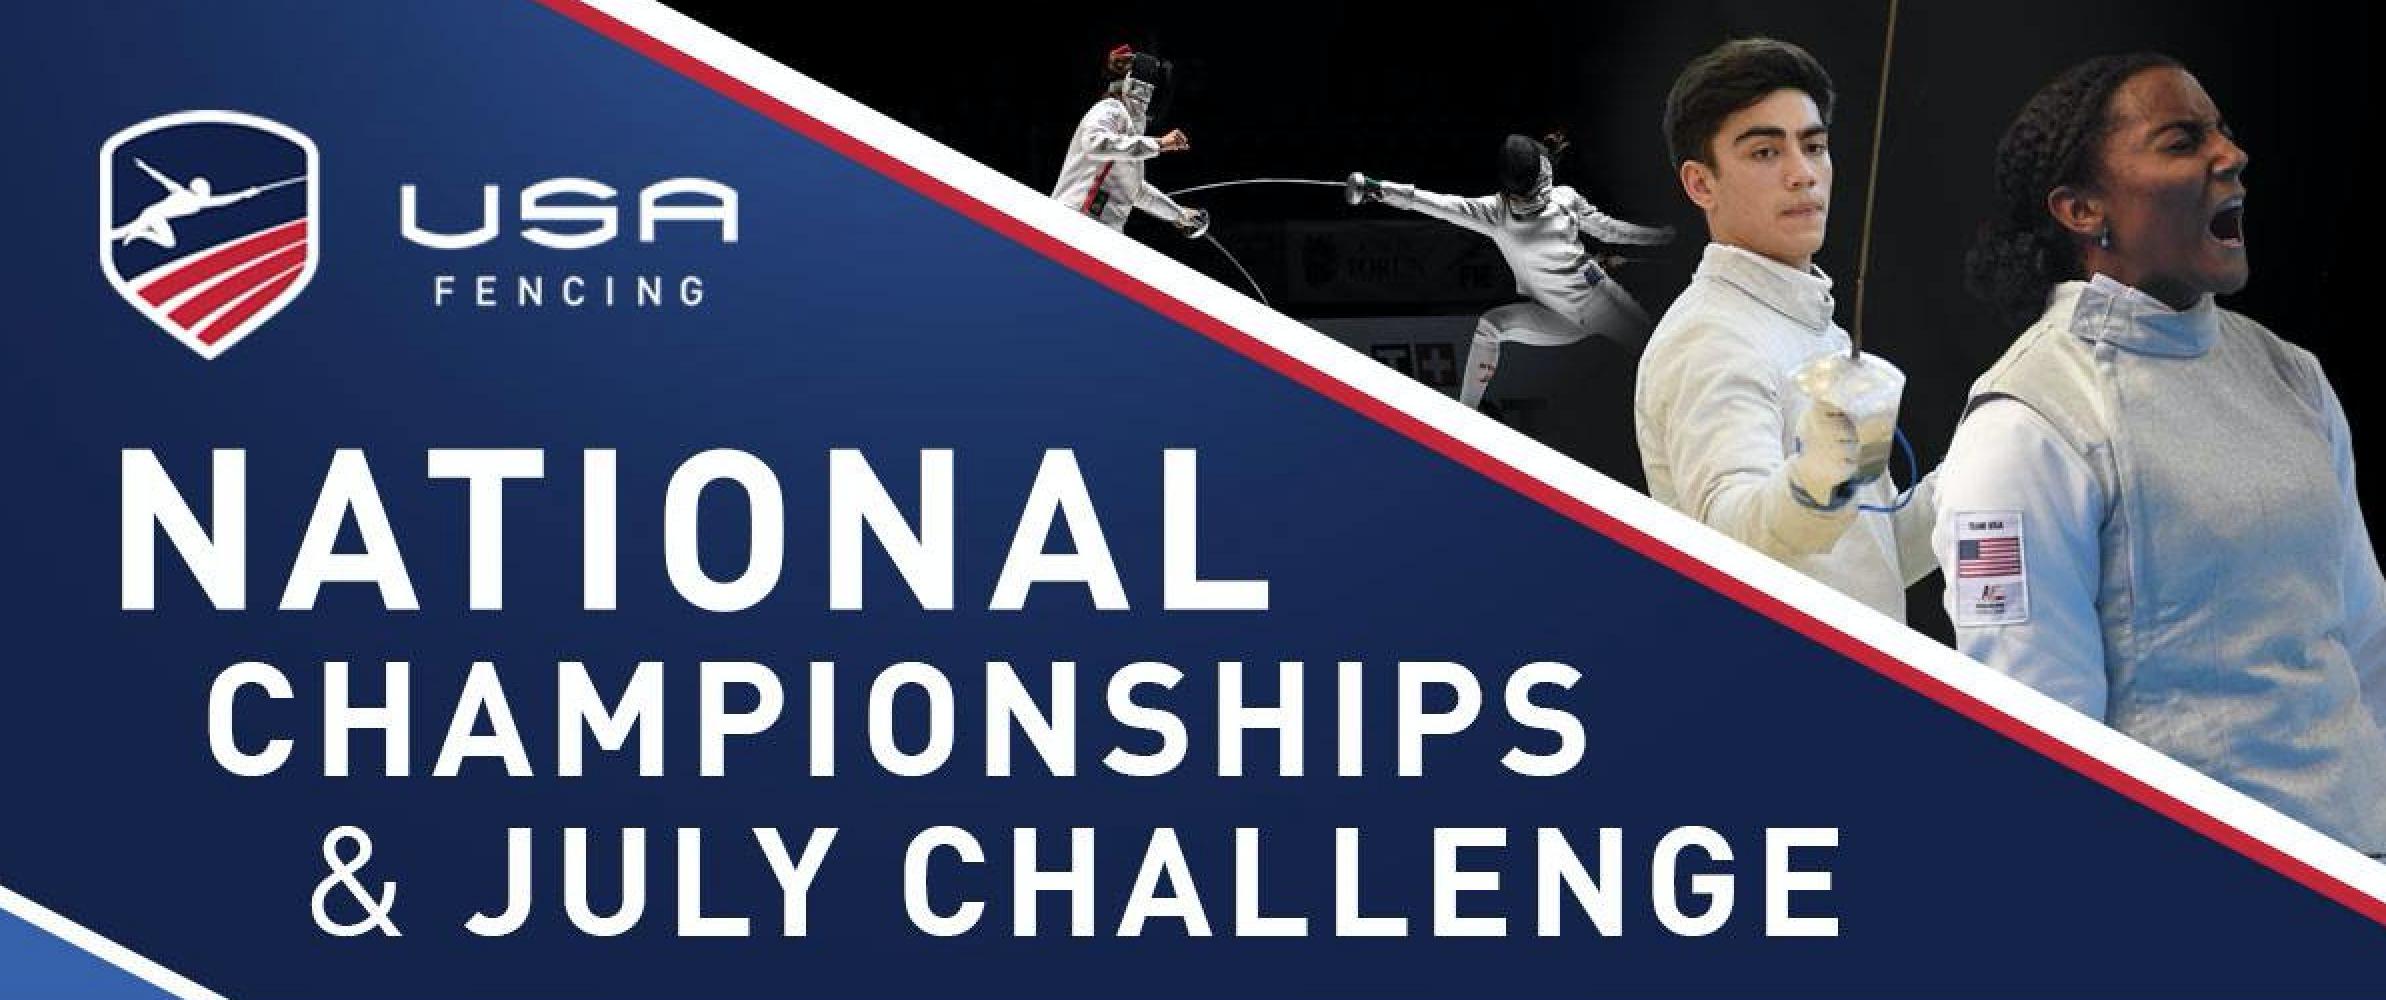 Medal Count Leaderboard - USA Fencing Summer Nationals 2019